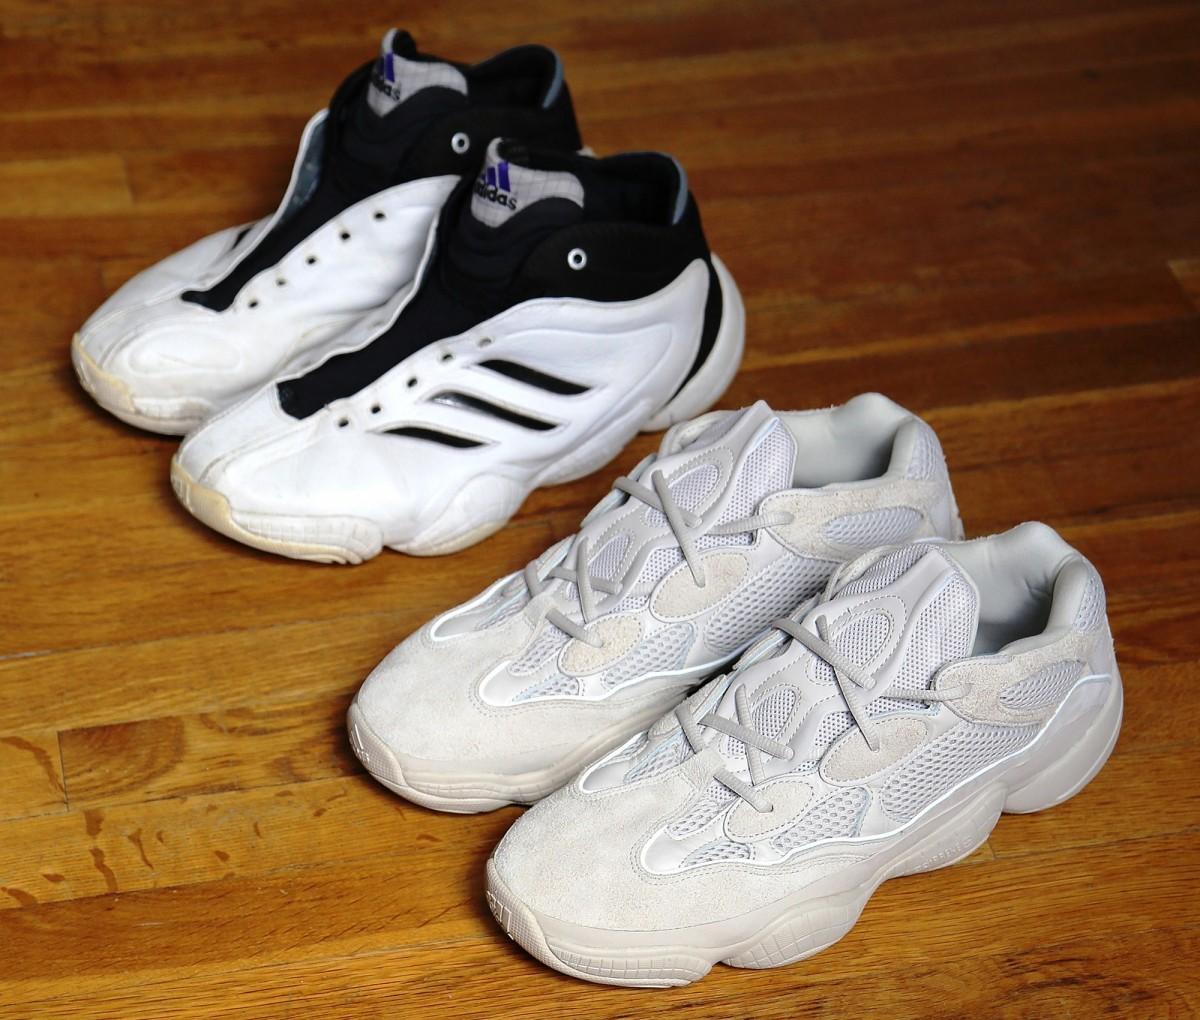 sepatu basket adidas kobe bryant